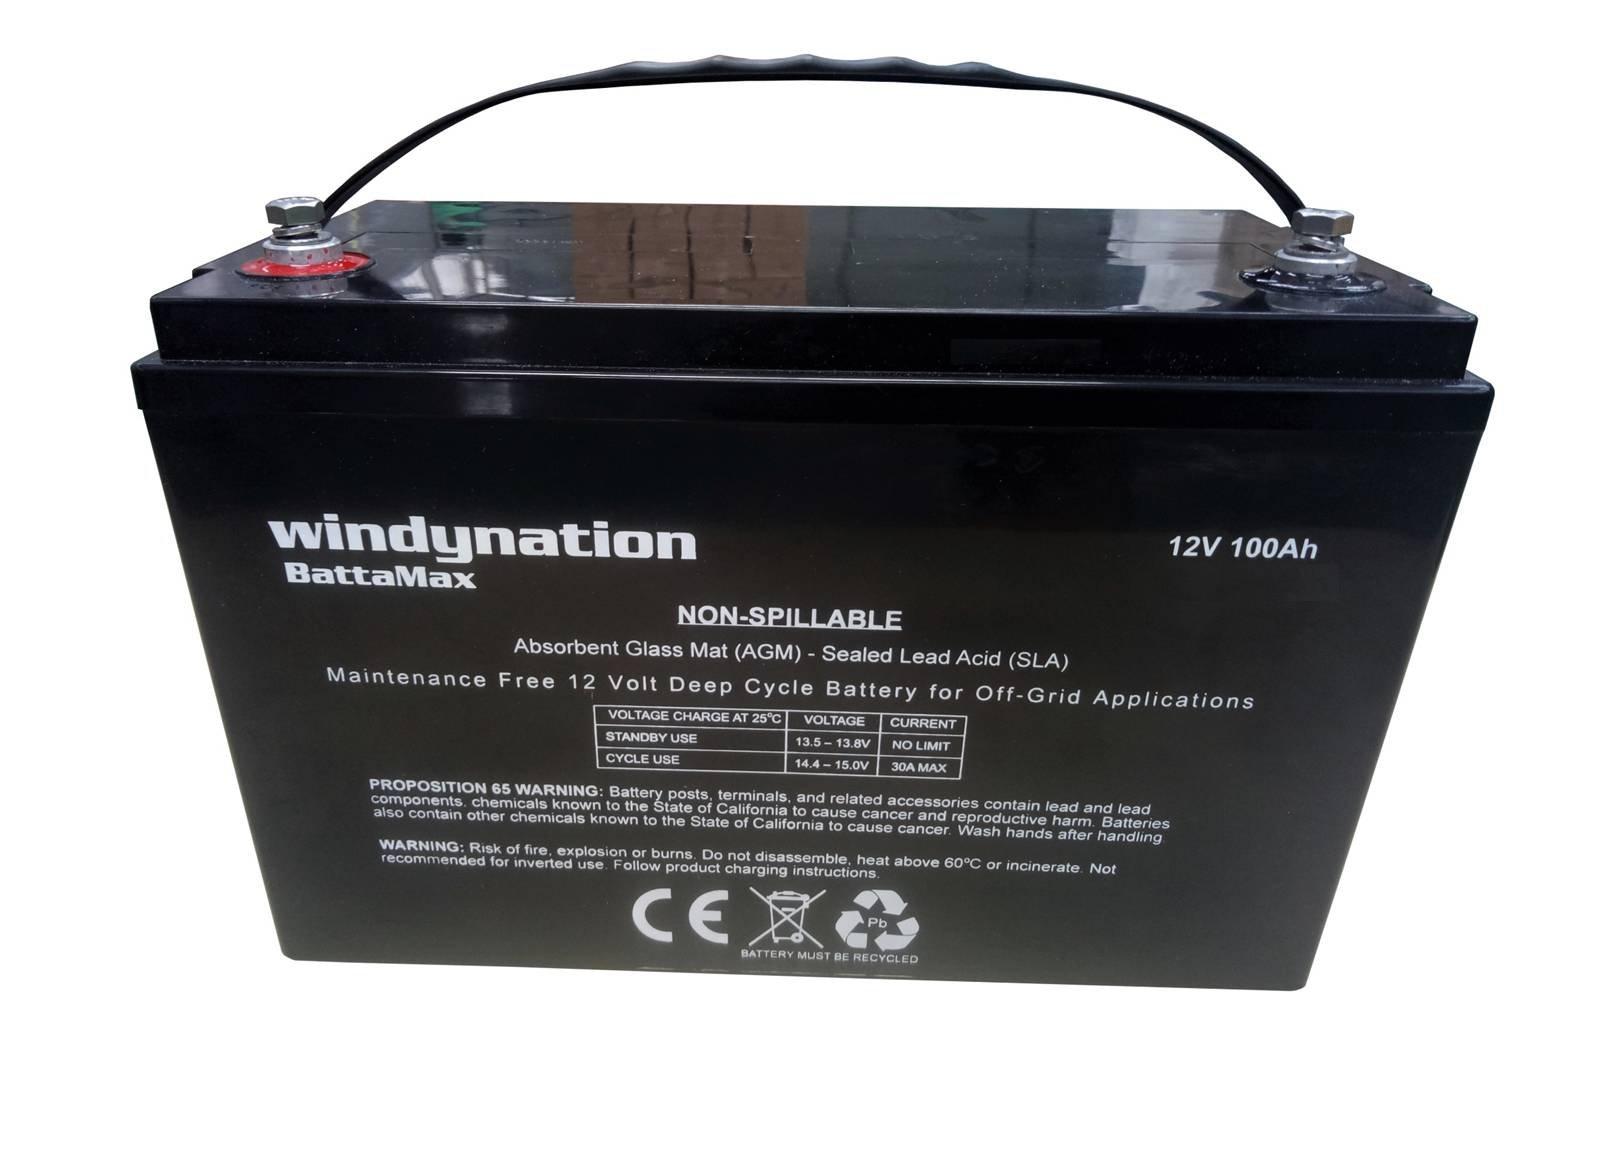 WindyNation 100 amp-hour 100AH 12V 12 Volt AGM Deep Cycle Sealed Lead Acid Battery -- Solar RV UPS Off-Grid (1 pc 100 amp-hour)